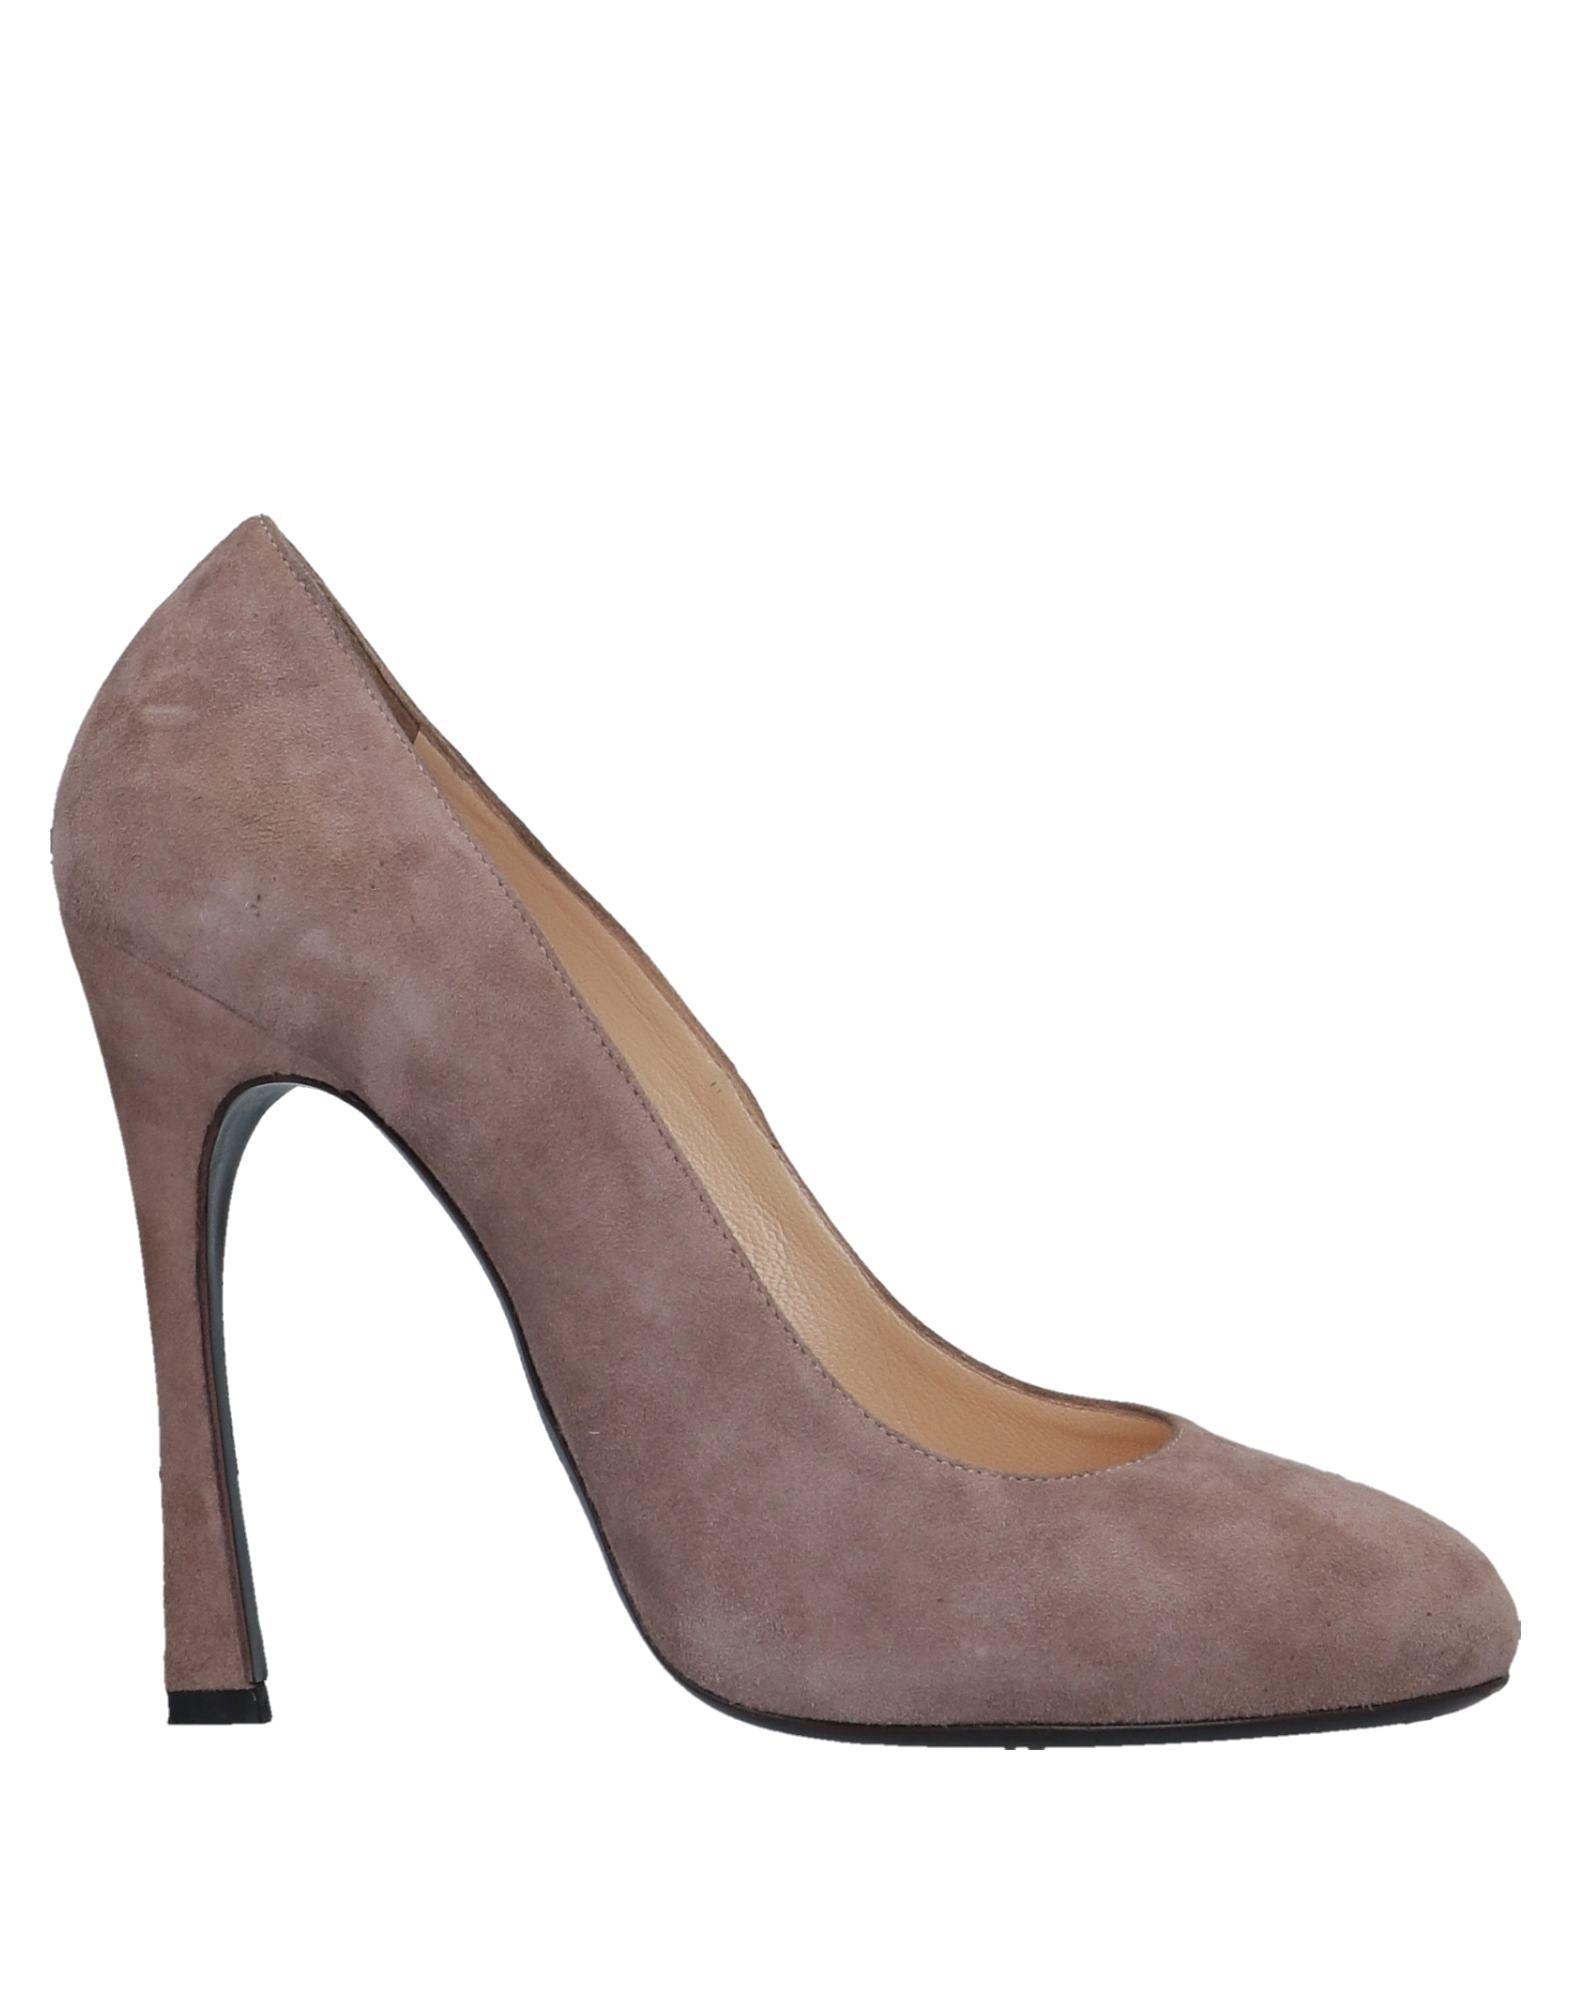 Rabatt Schuhe Gianmarco Lorenzi Pumps Damen  11536755JM